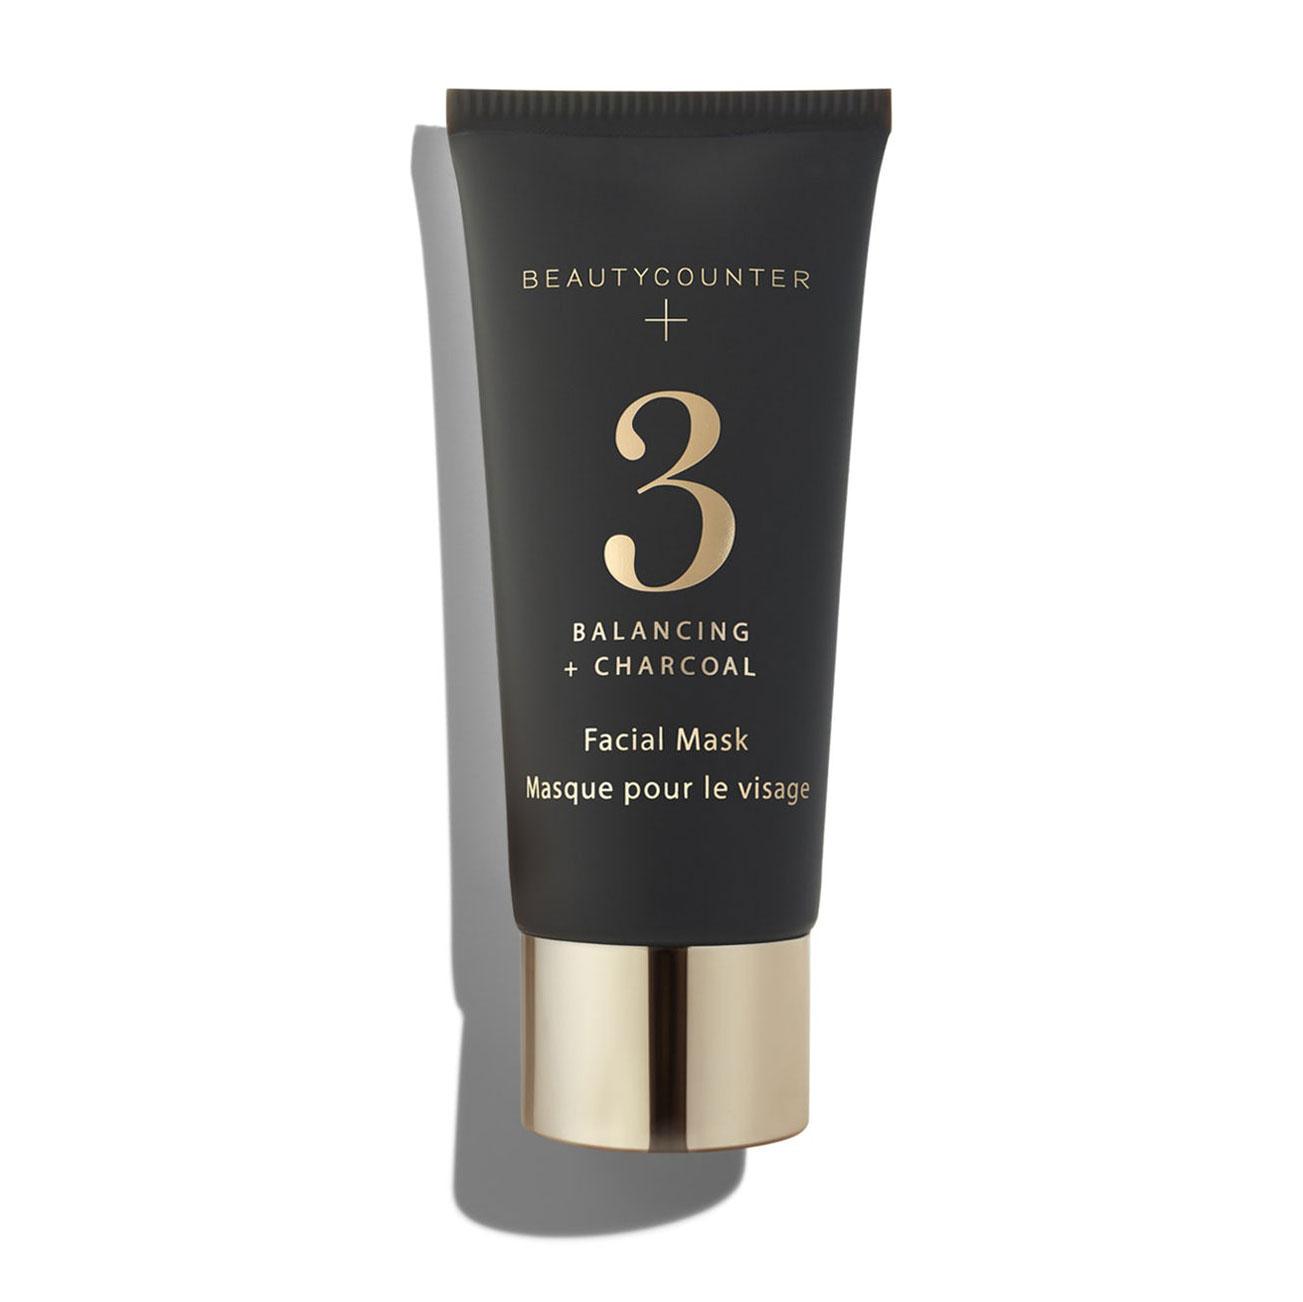 No. 3 Balancing Facial Mask from Beautycounter